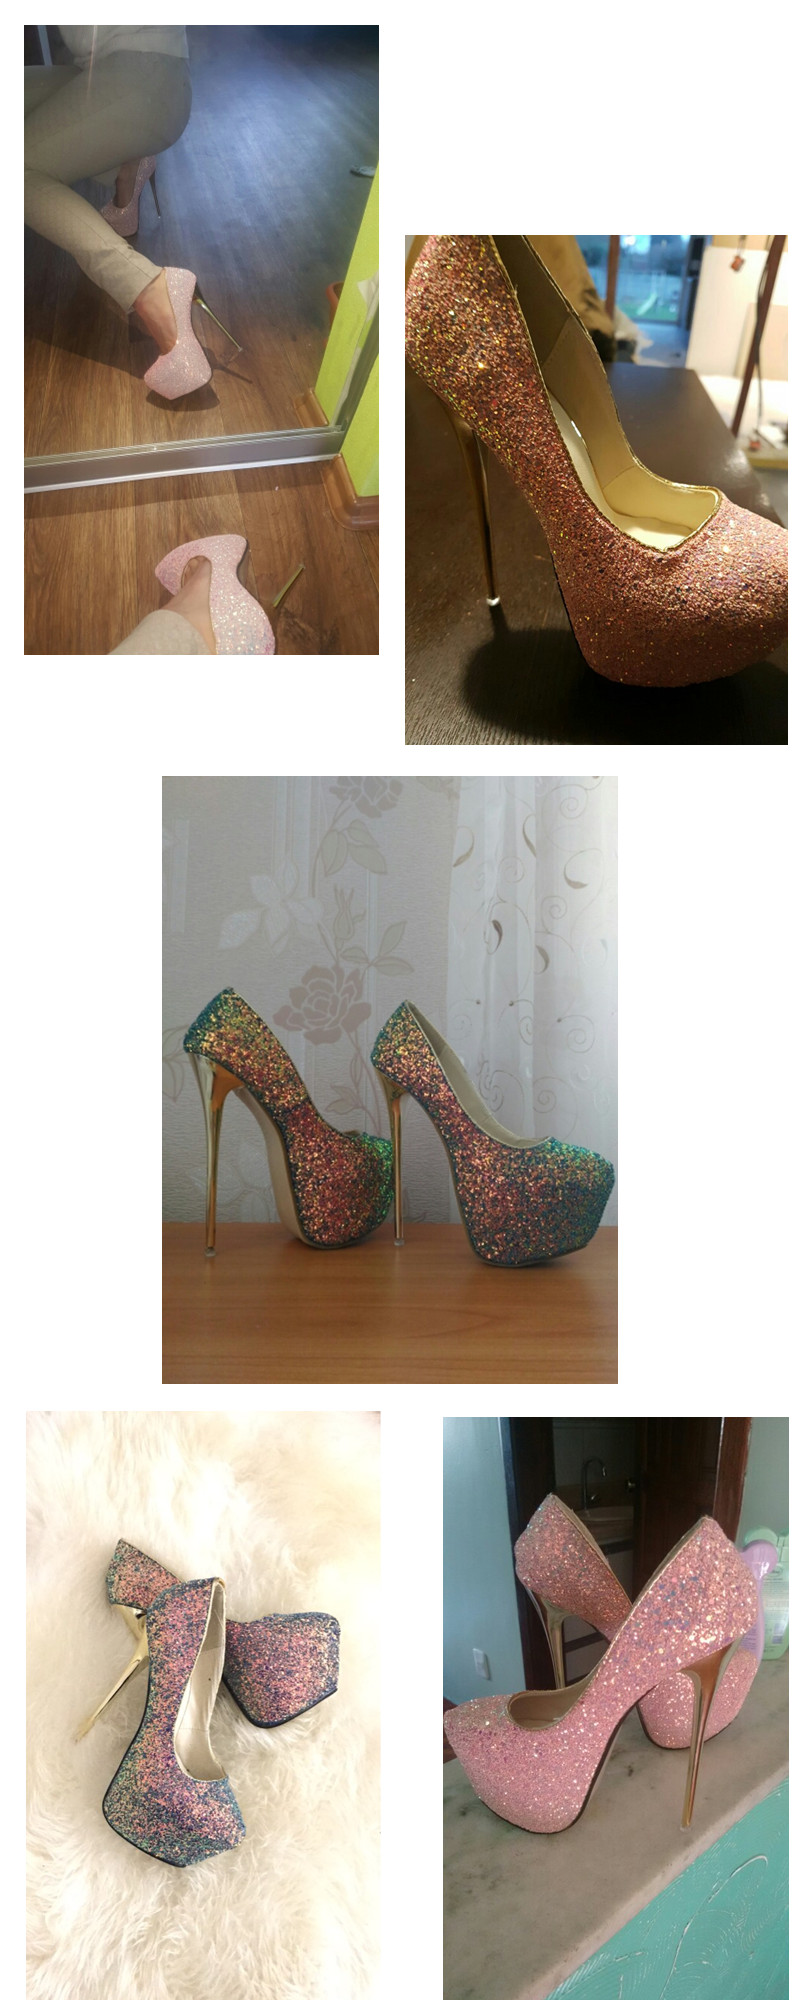 HTB1krn0QVXXXXaxXVXXq6xXFXXXb - Gdgydh Fashion Women Platform Shoes 2017 New Spring Autumn Bling Women Pumps Thin Heels Sexy Slim Party Shoes High Heels